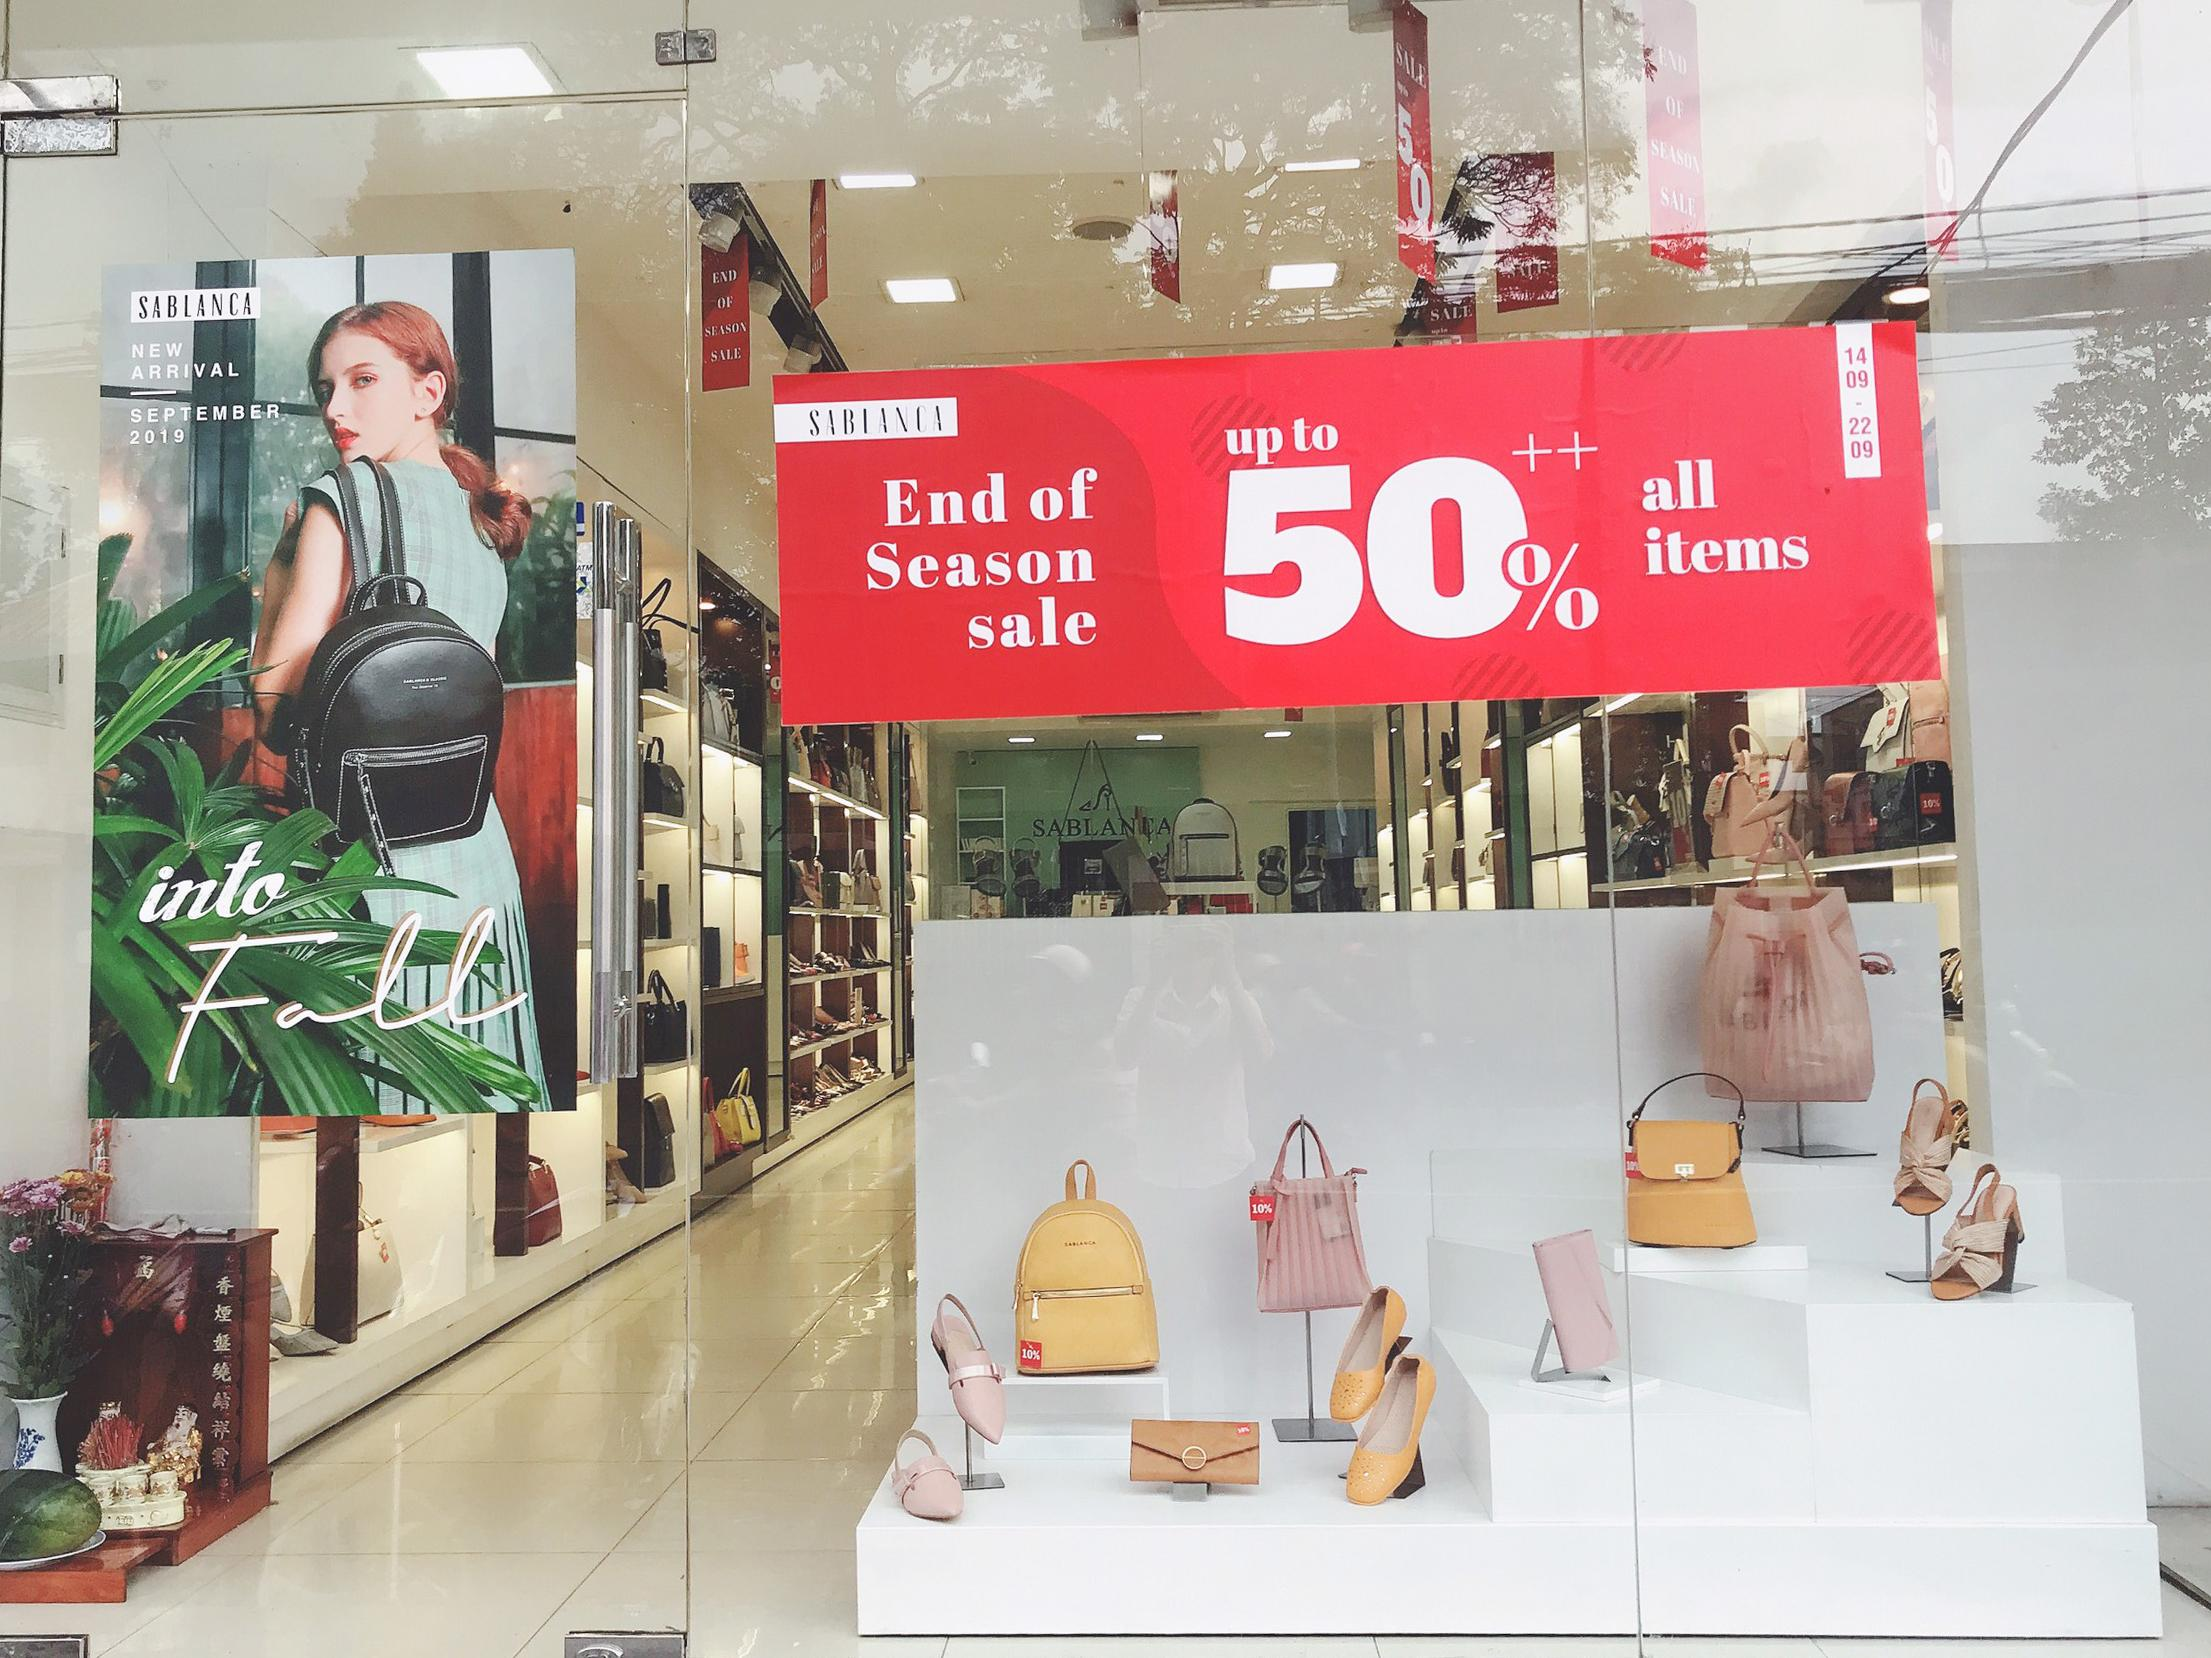 sablanca-end-of-season-sale